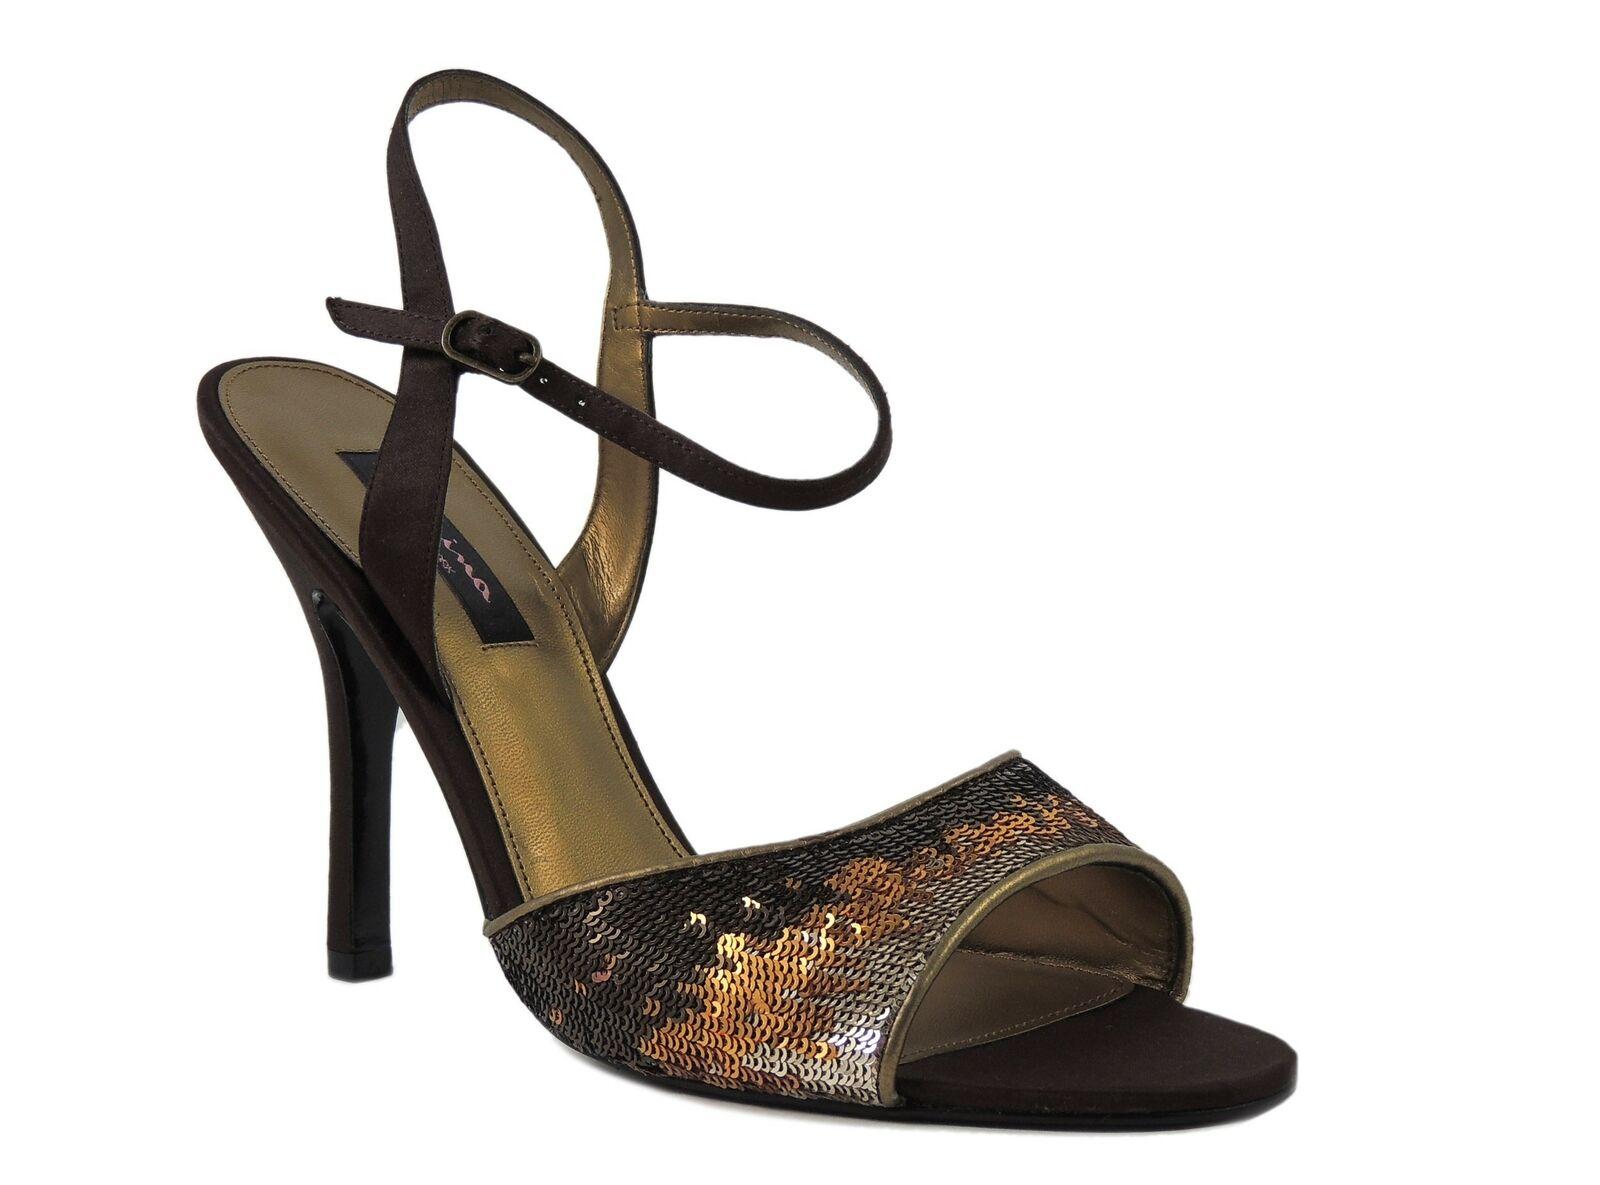 Nina Women's Cyrena Slingback Sandals Chocolate Bronze Size 11 M